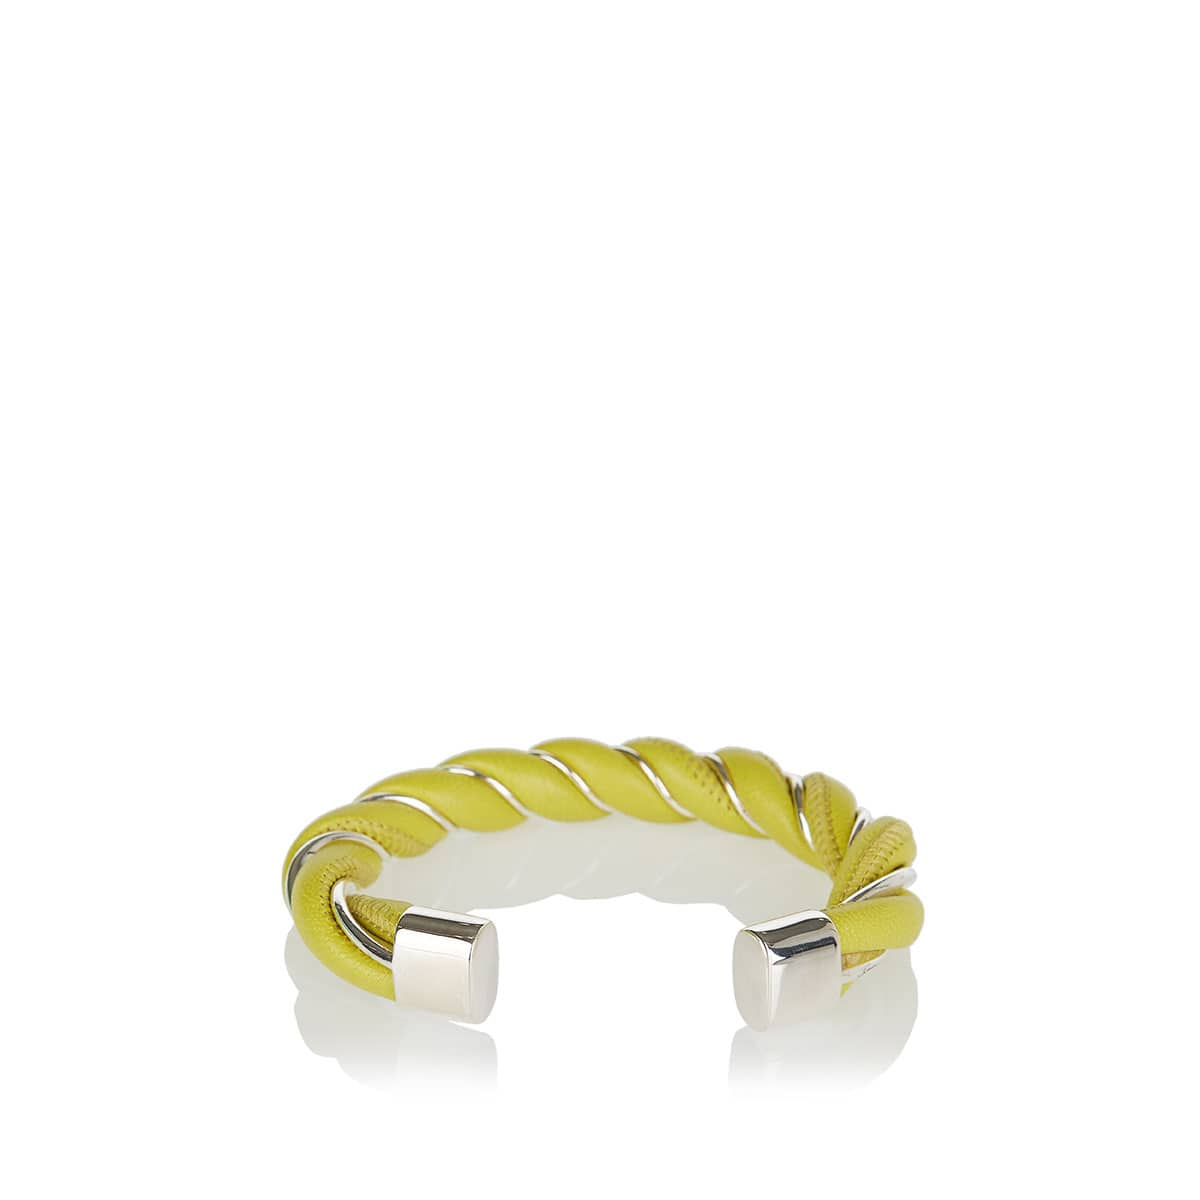 Twisted leather bracelet